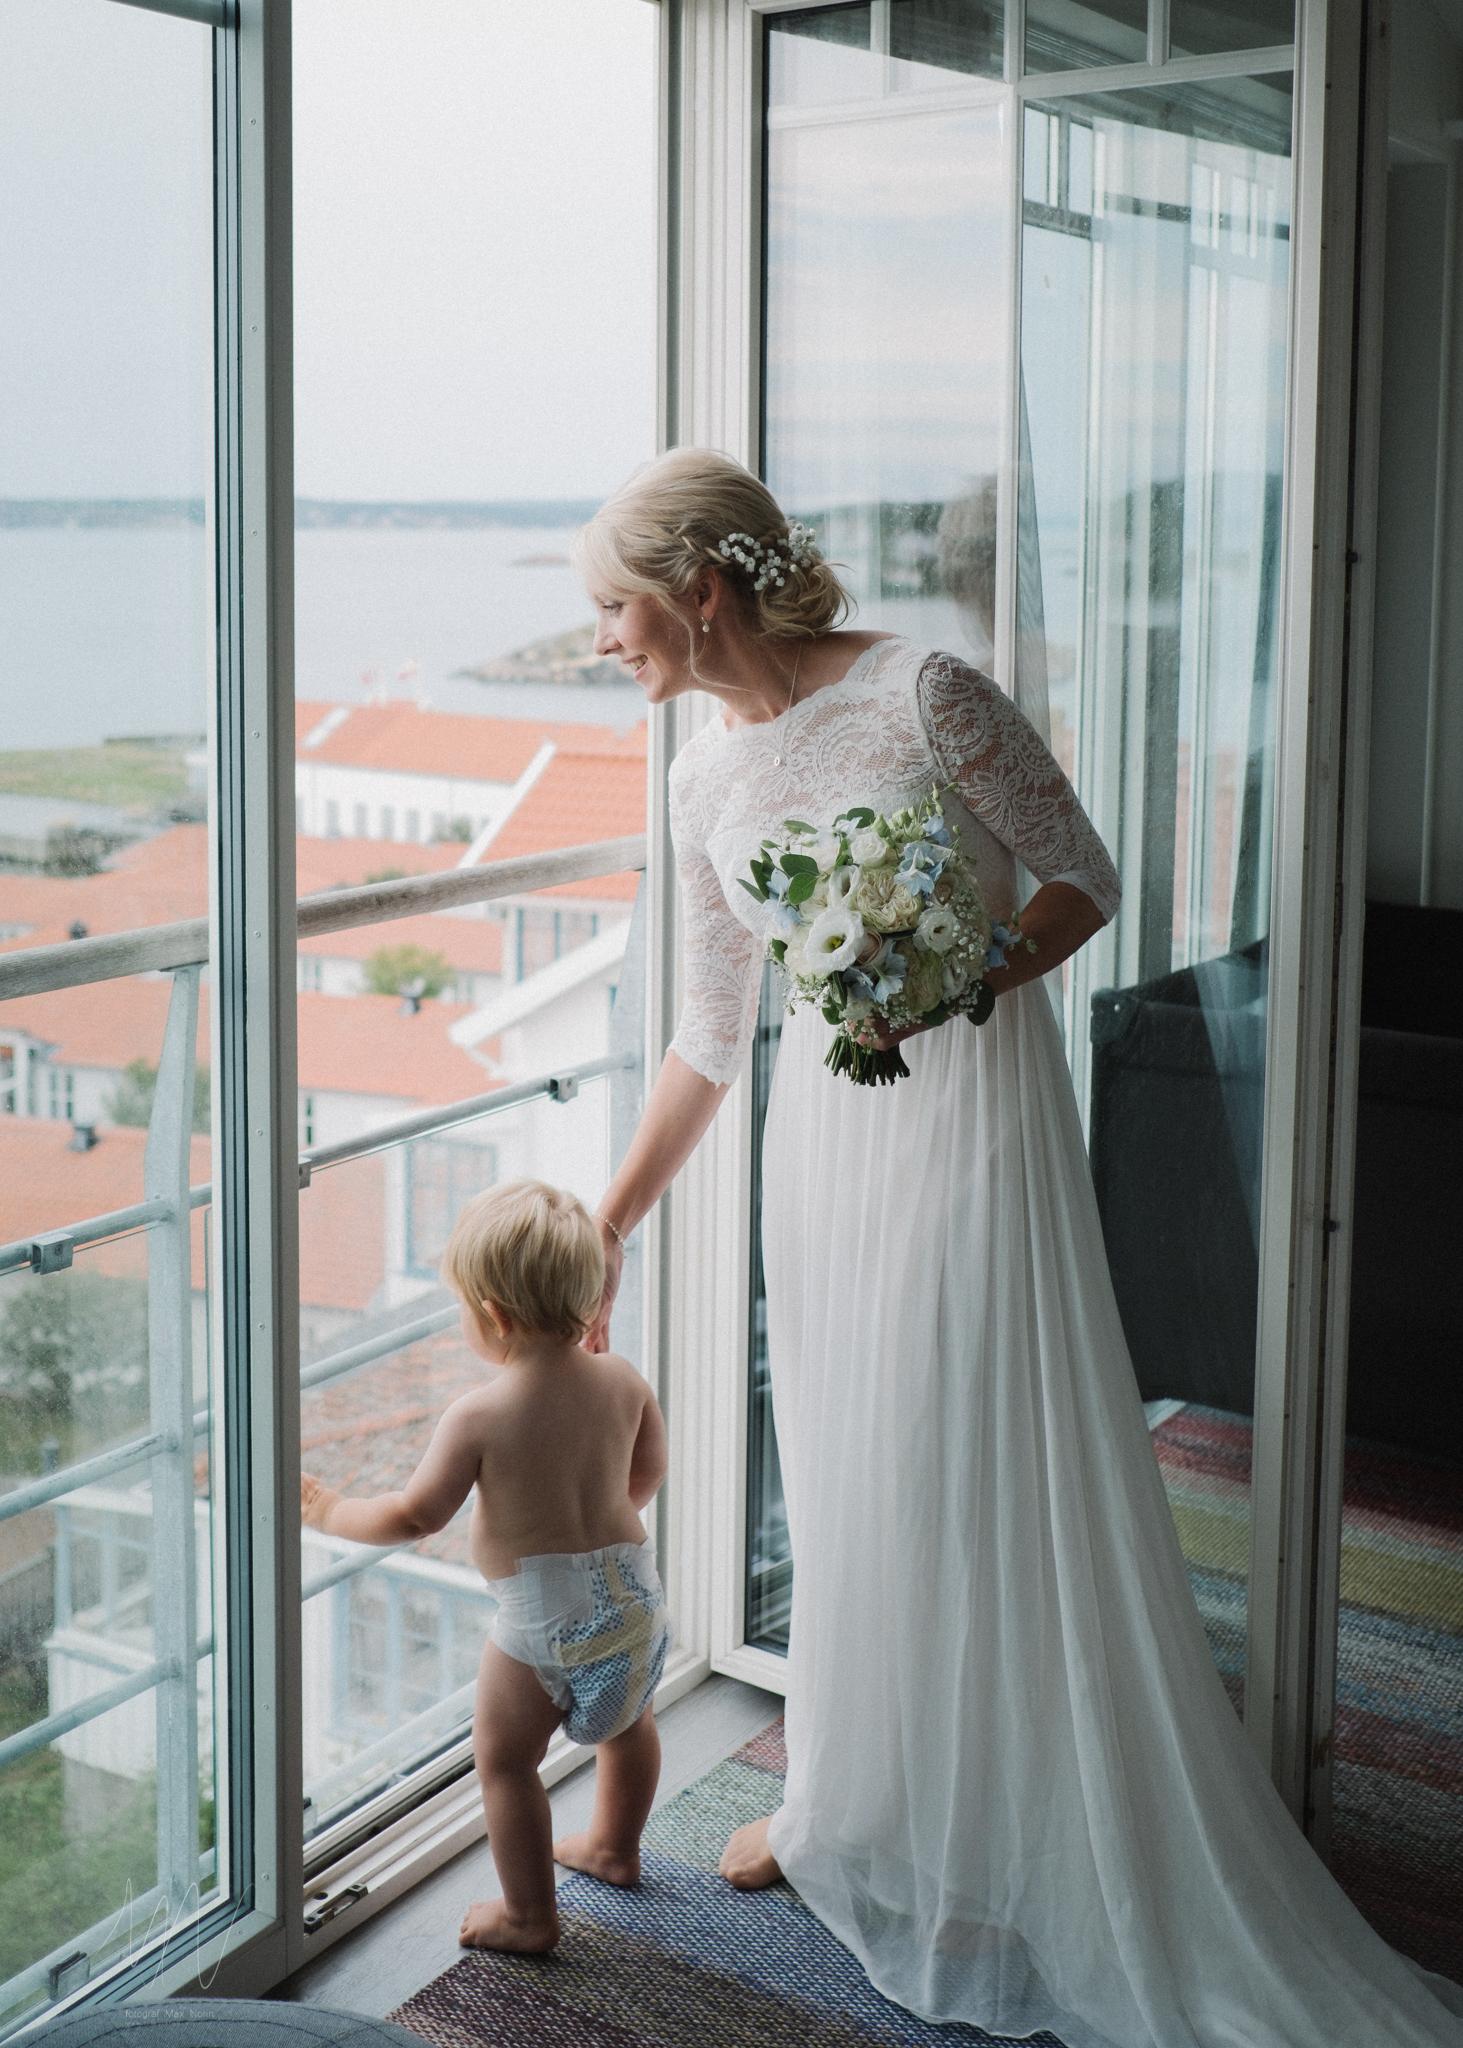 Bröllop-fotografmaxnorin.se-MariaMarcus-15.JPG